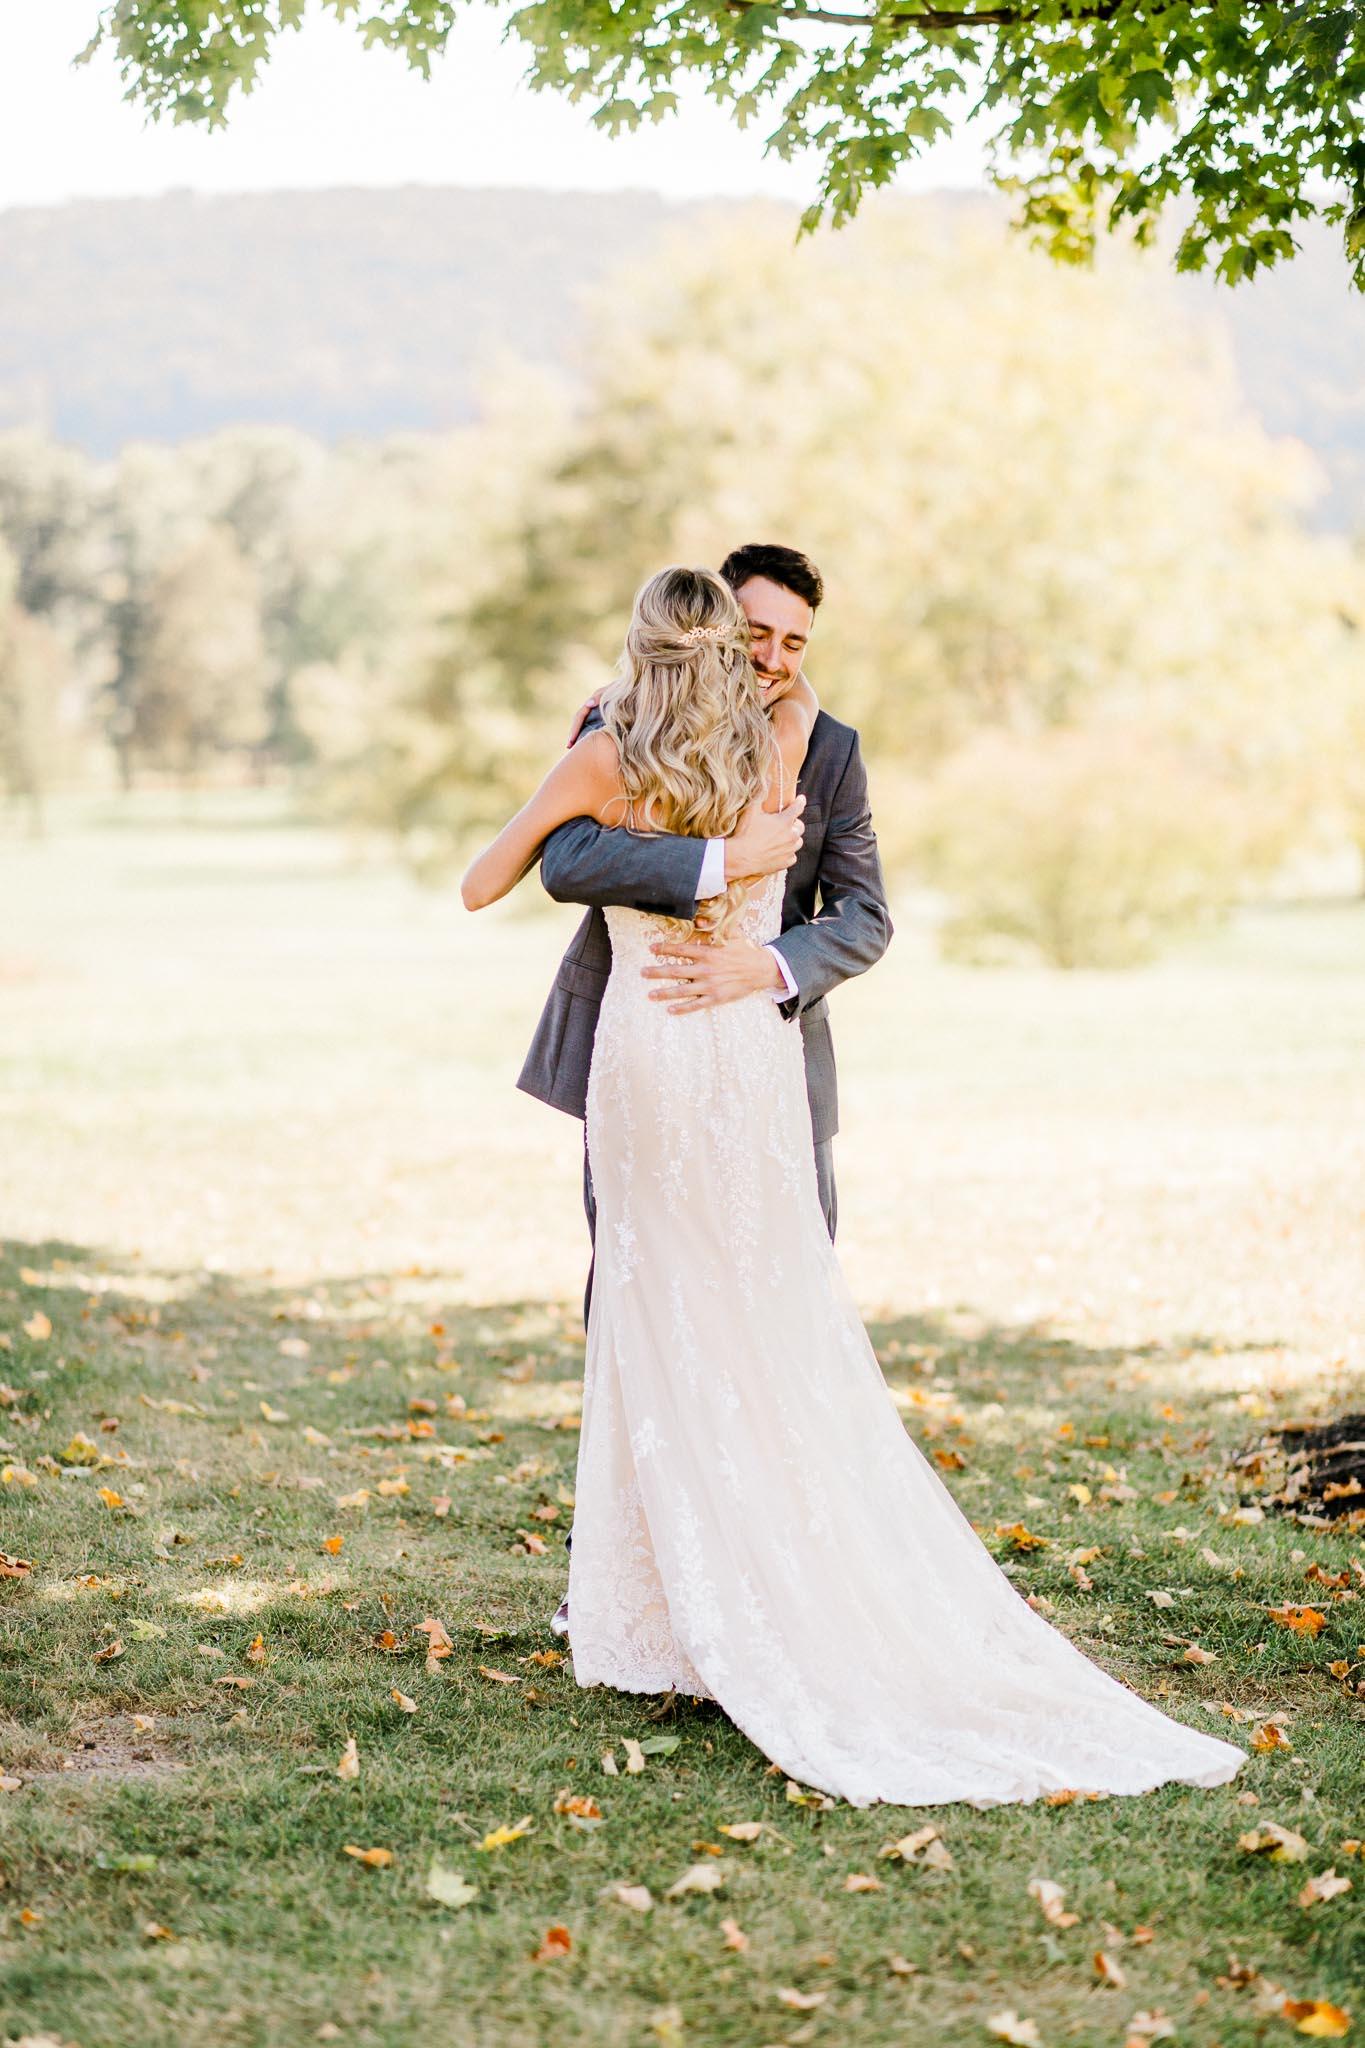 Frosty-Valley-September-Wedding-7168.jpg